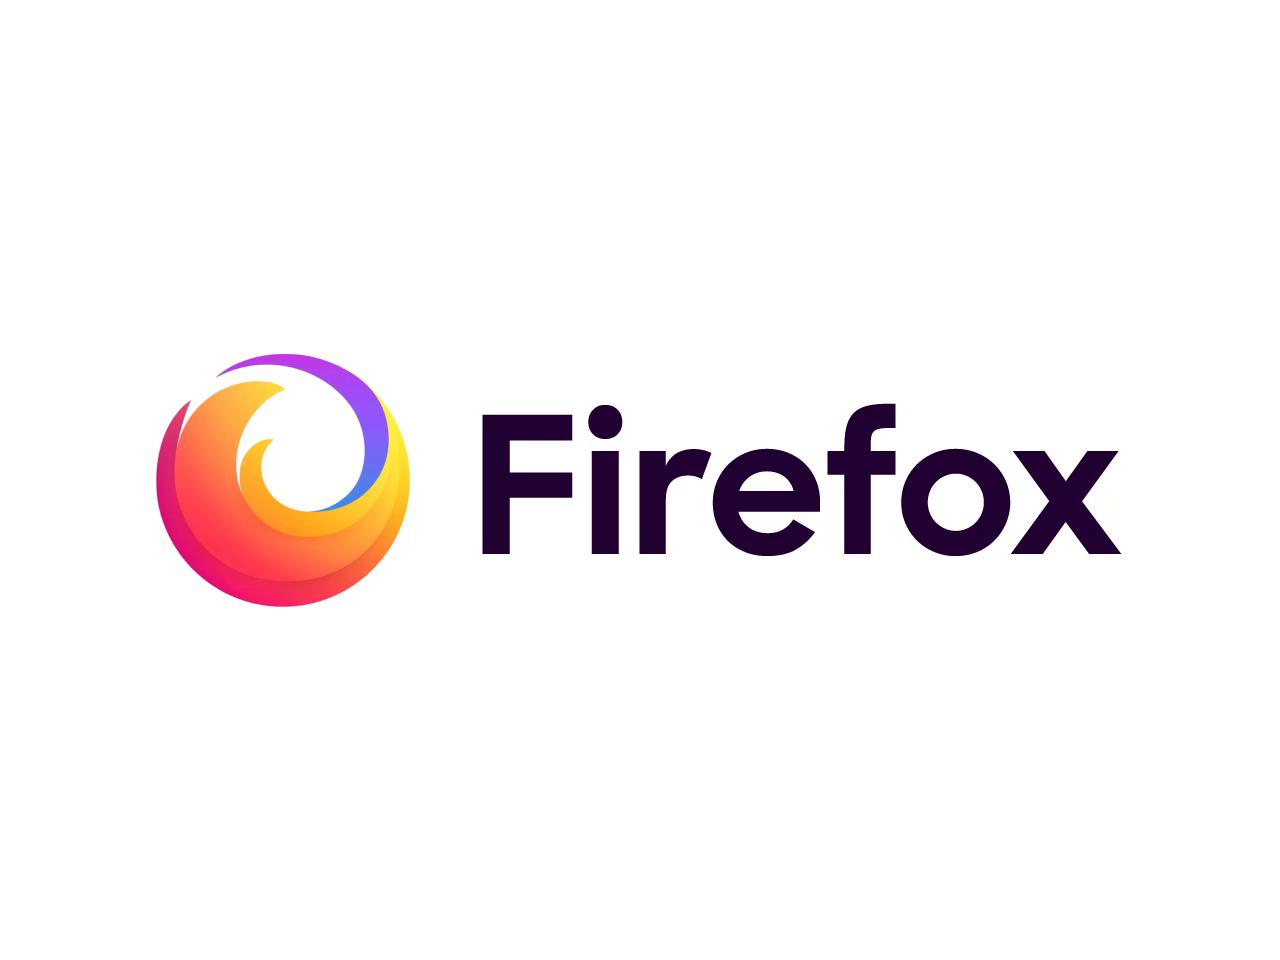 Firefox logo rebranding